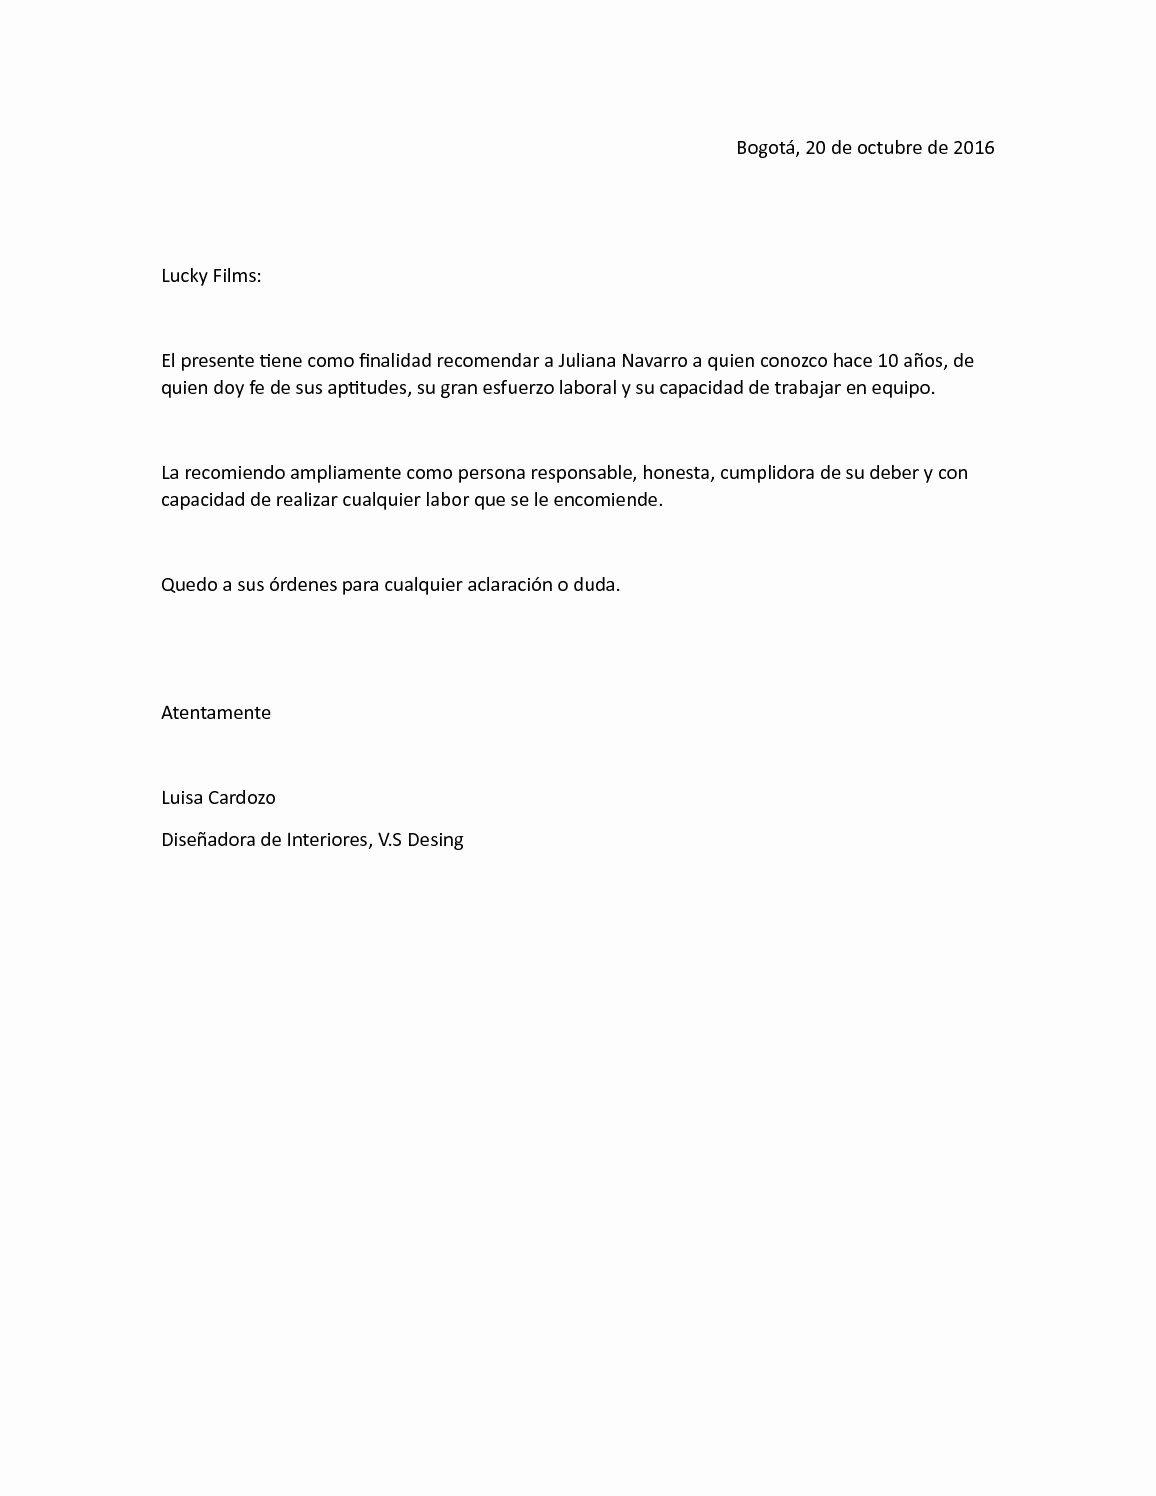 Machote Carta De Recomendacion Personal Lovely Calaméo Ejemplo Carta De Re Endacion Personal